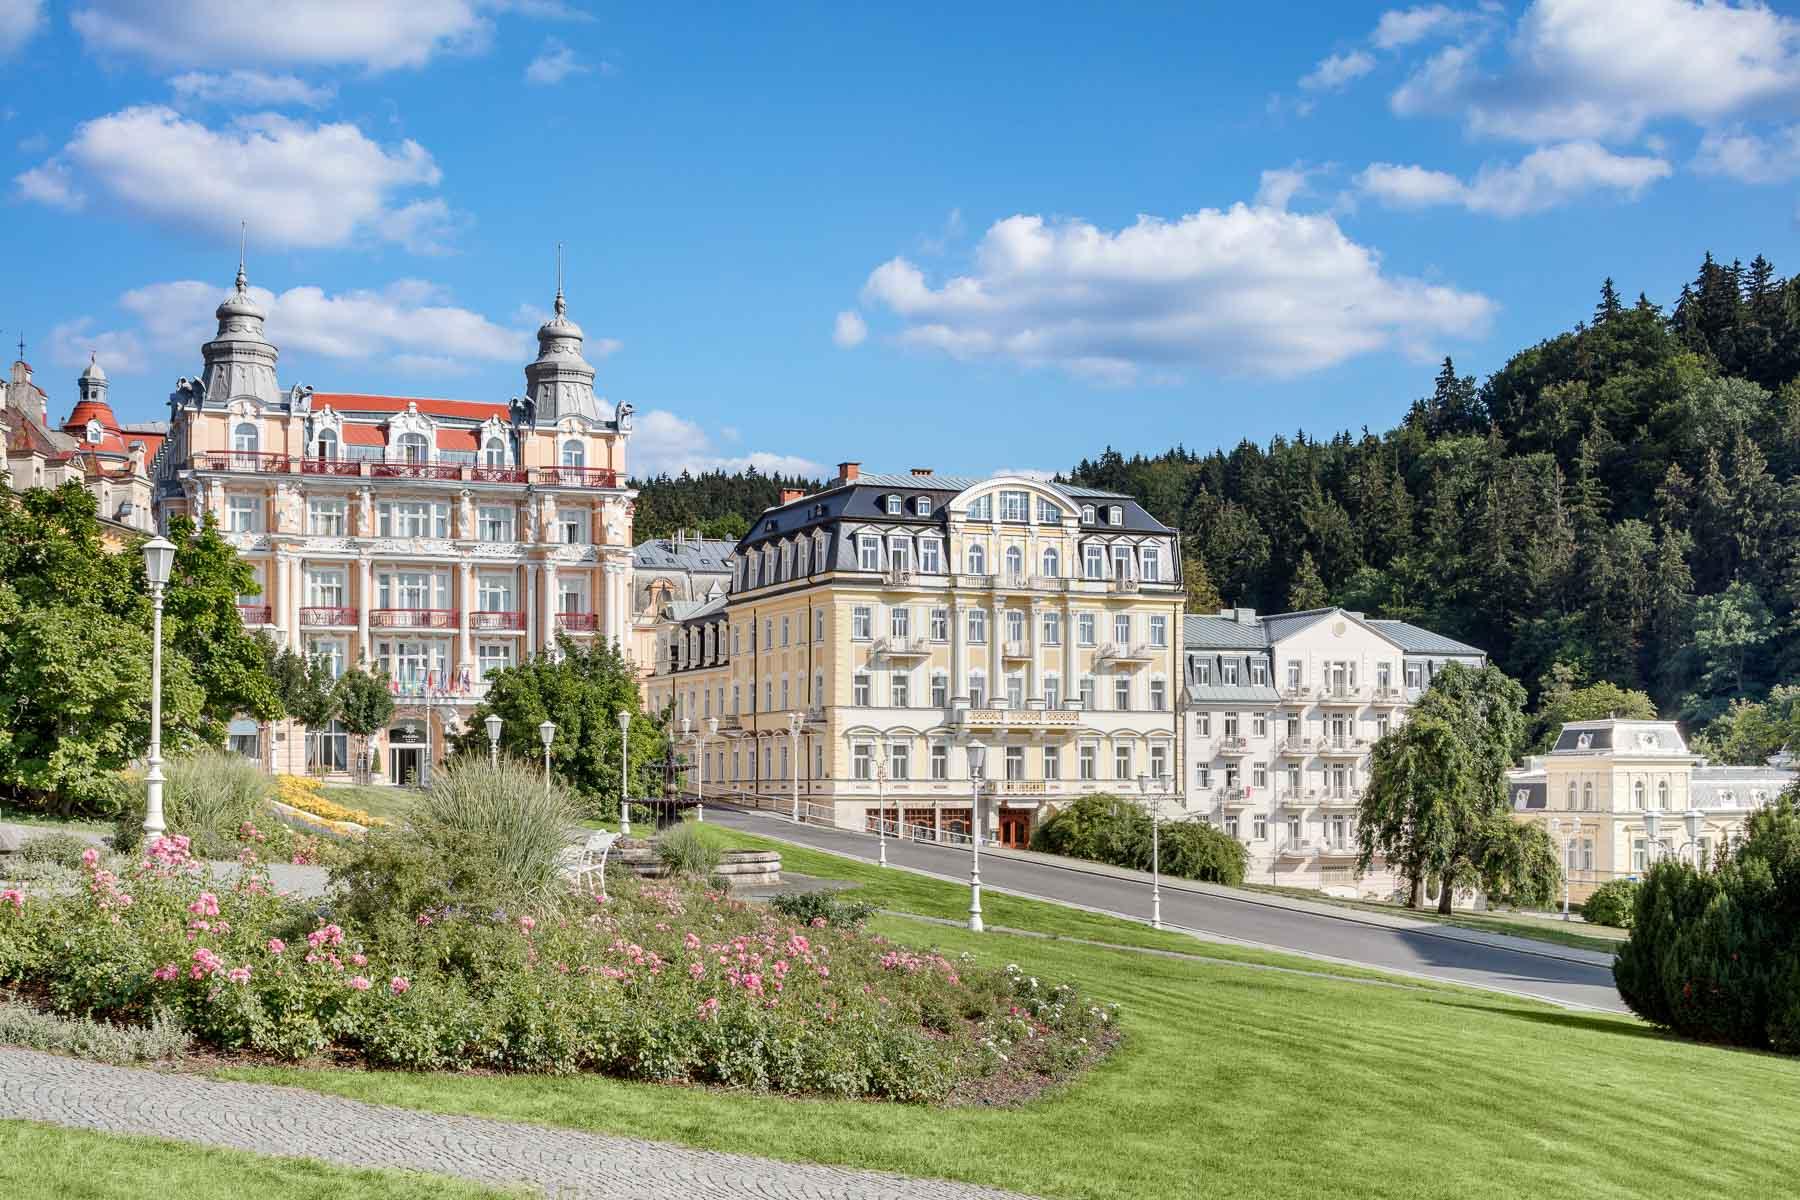 Hotel Hvezda, Imperial and Maria Spa, exterier, Marienbad, Marianske lazne, spa